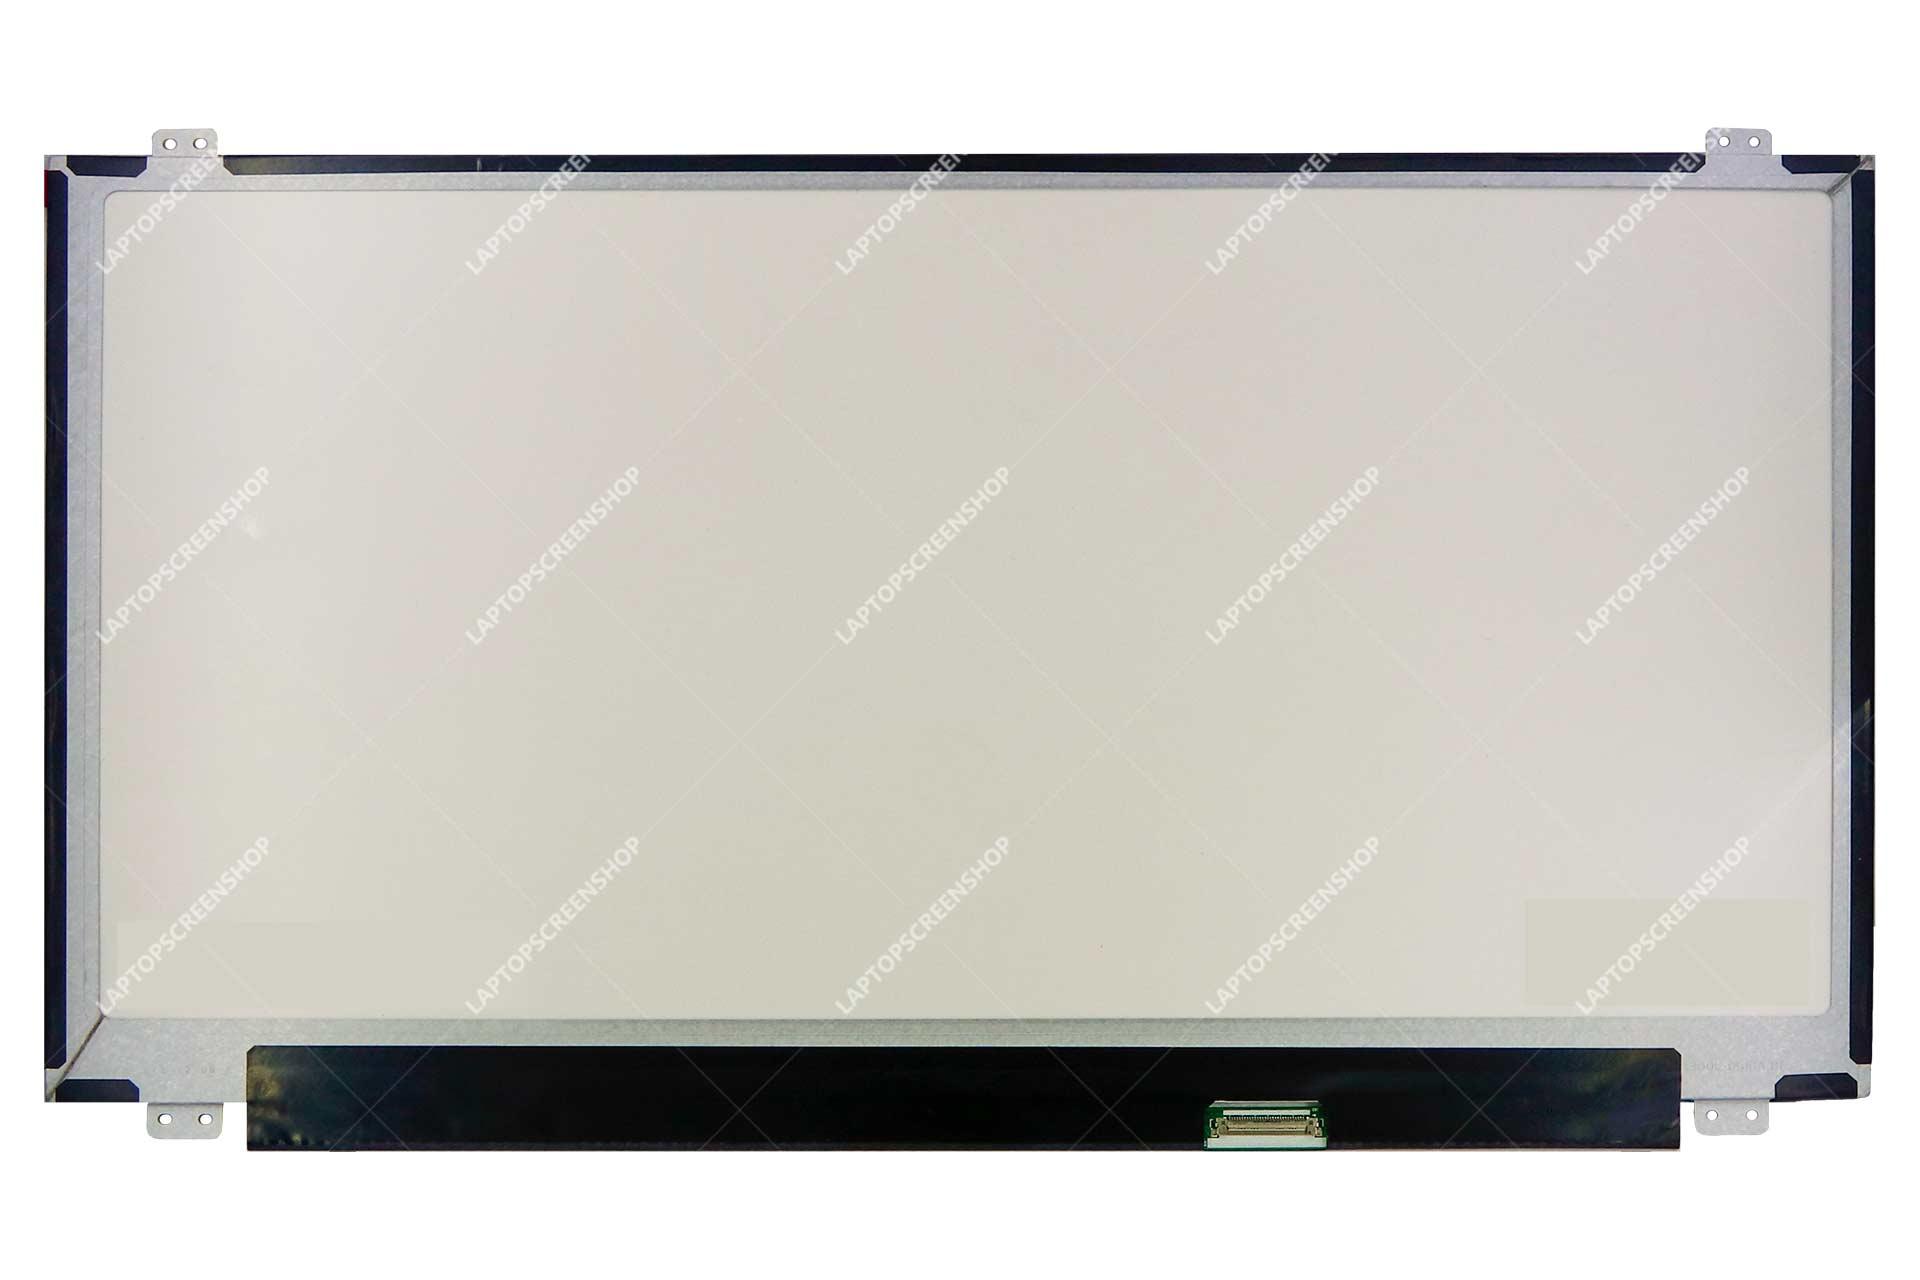 ACER-ASPIRE-E1-422-3678-LCD-LCD |HD|فروشگاه لپ تاپ اسکرين | تعمير لپ تاپ